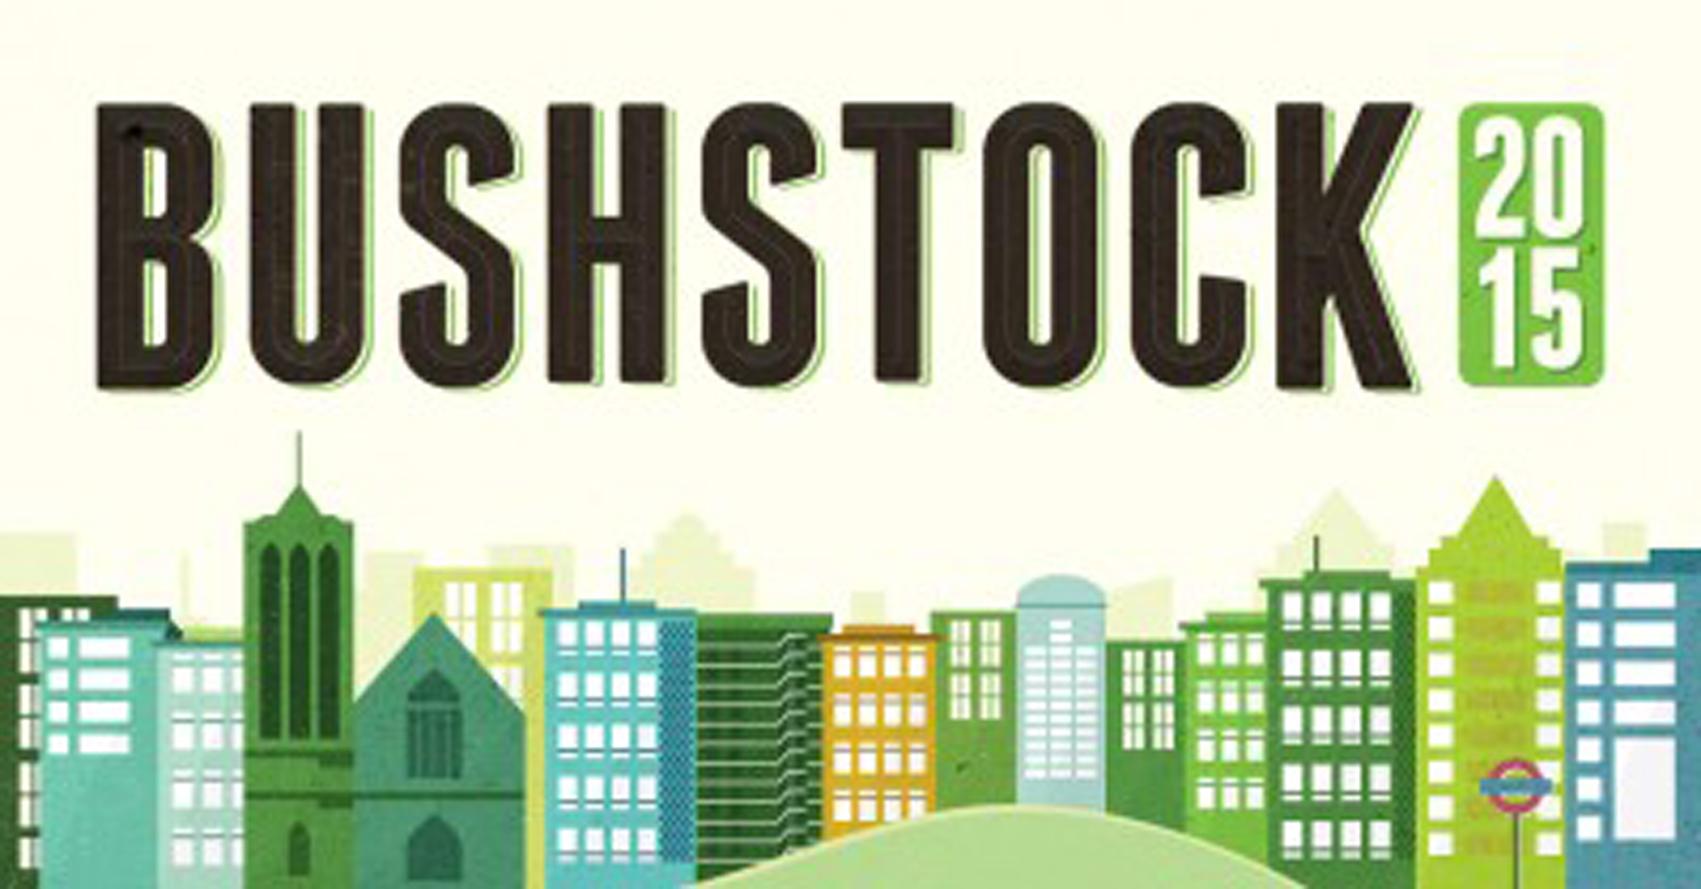 Bushstock-2015